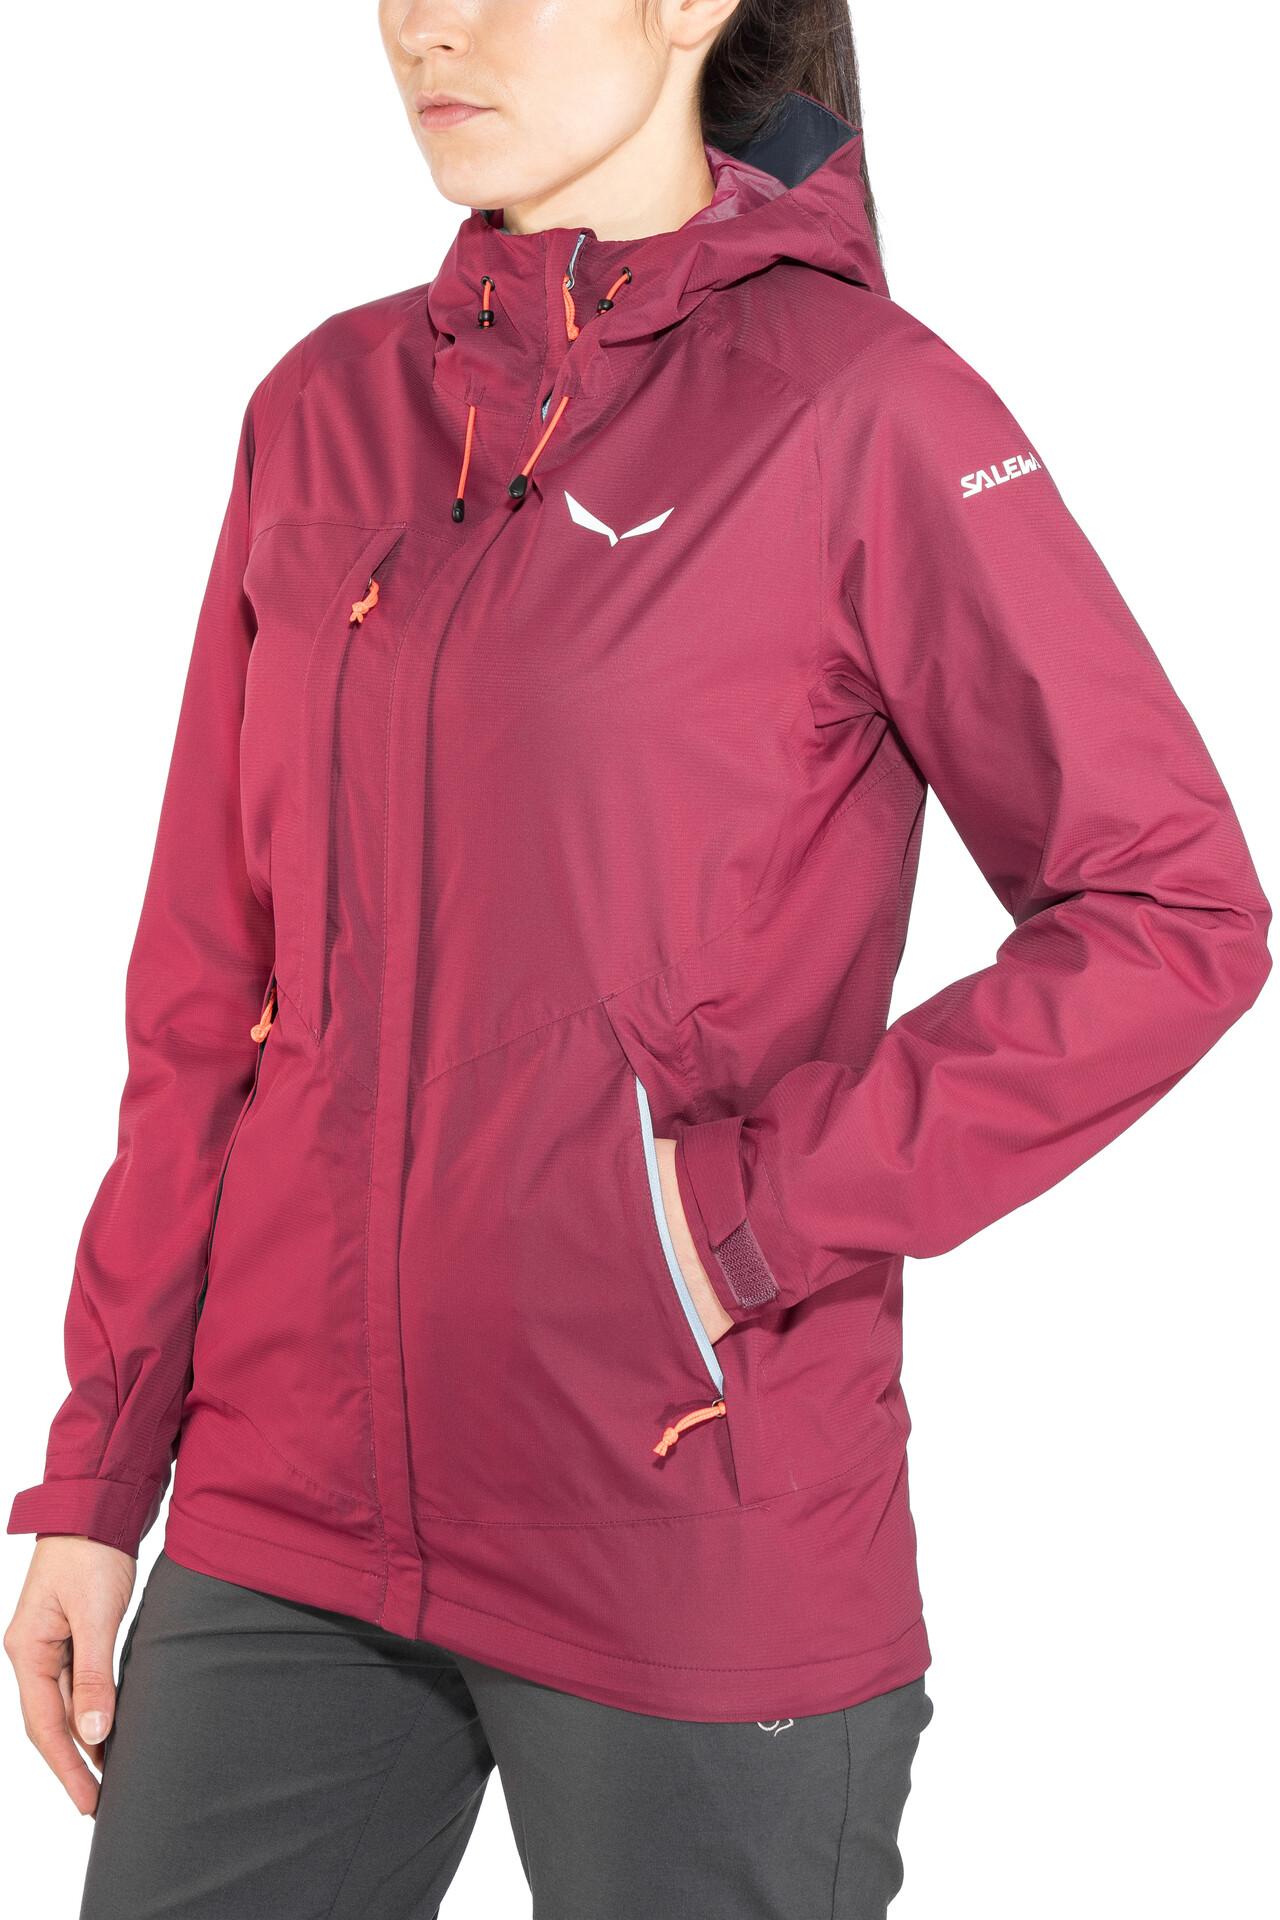 salewa 2 layer jacket ladies ad6592d2